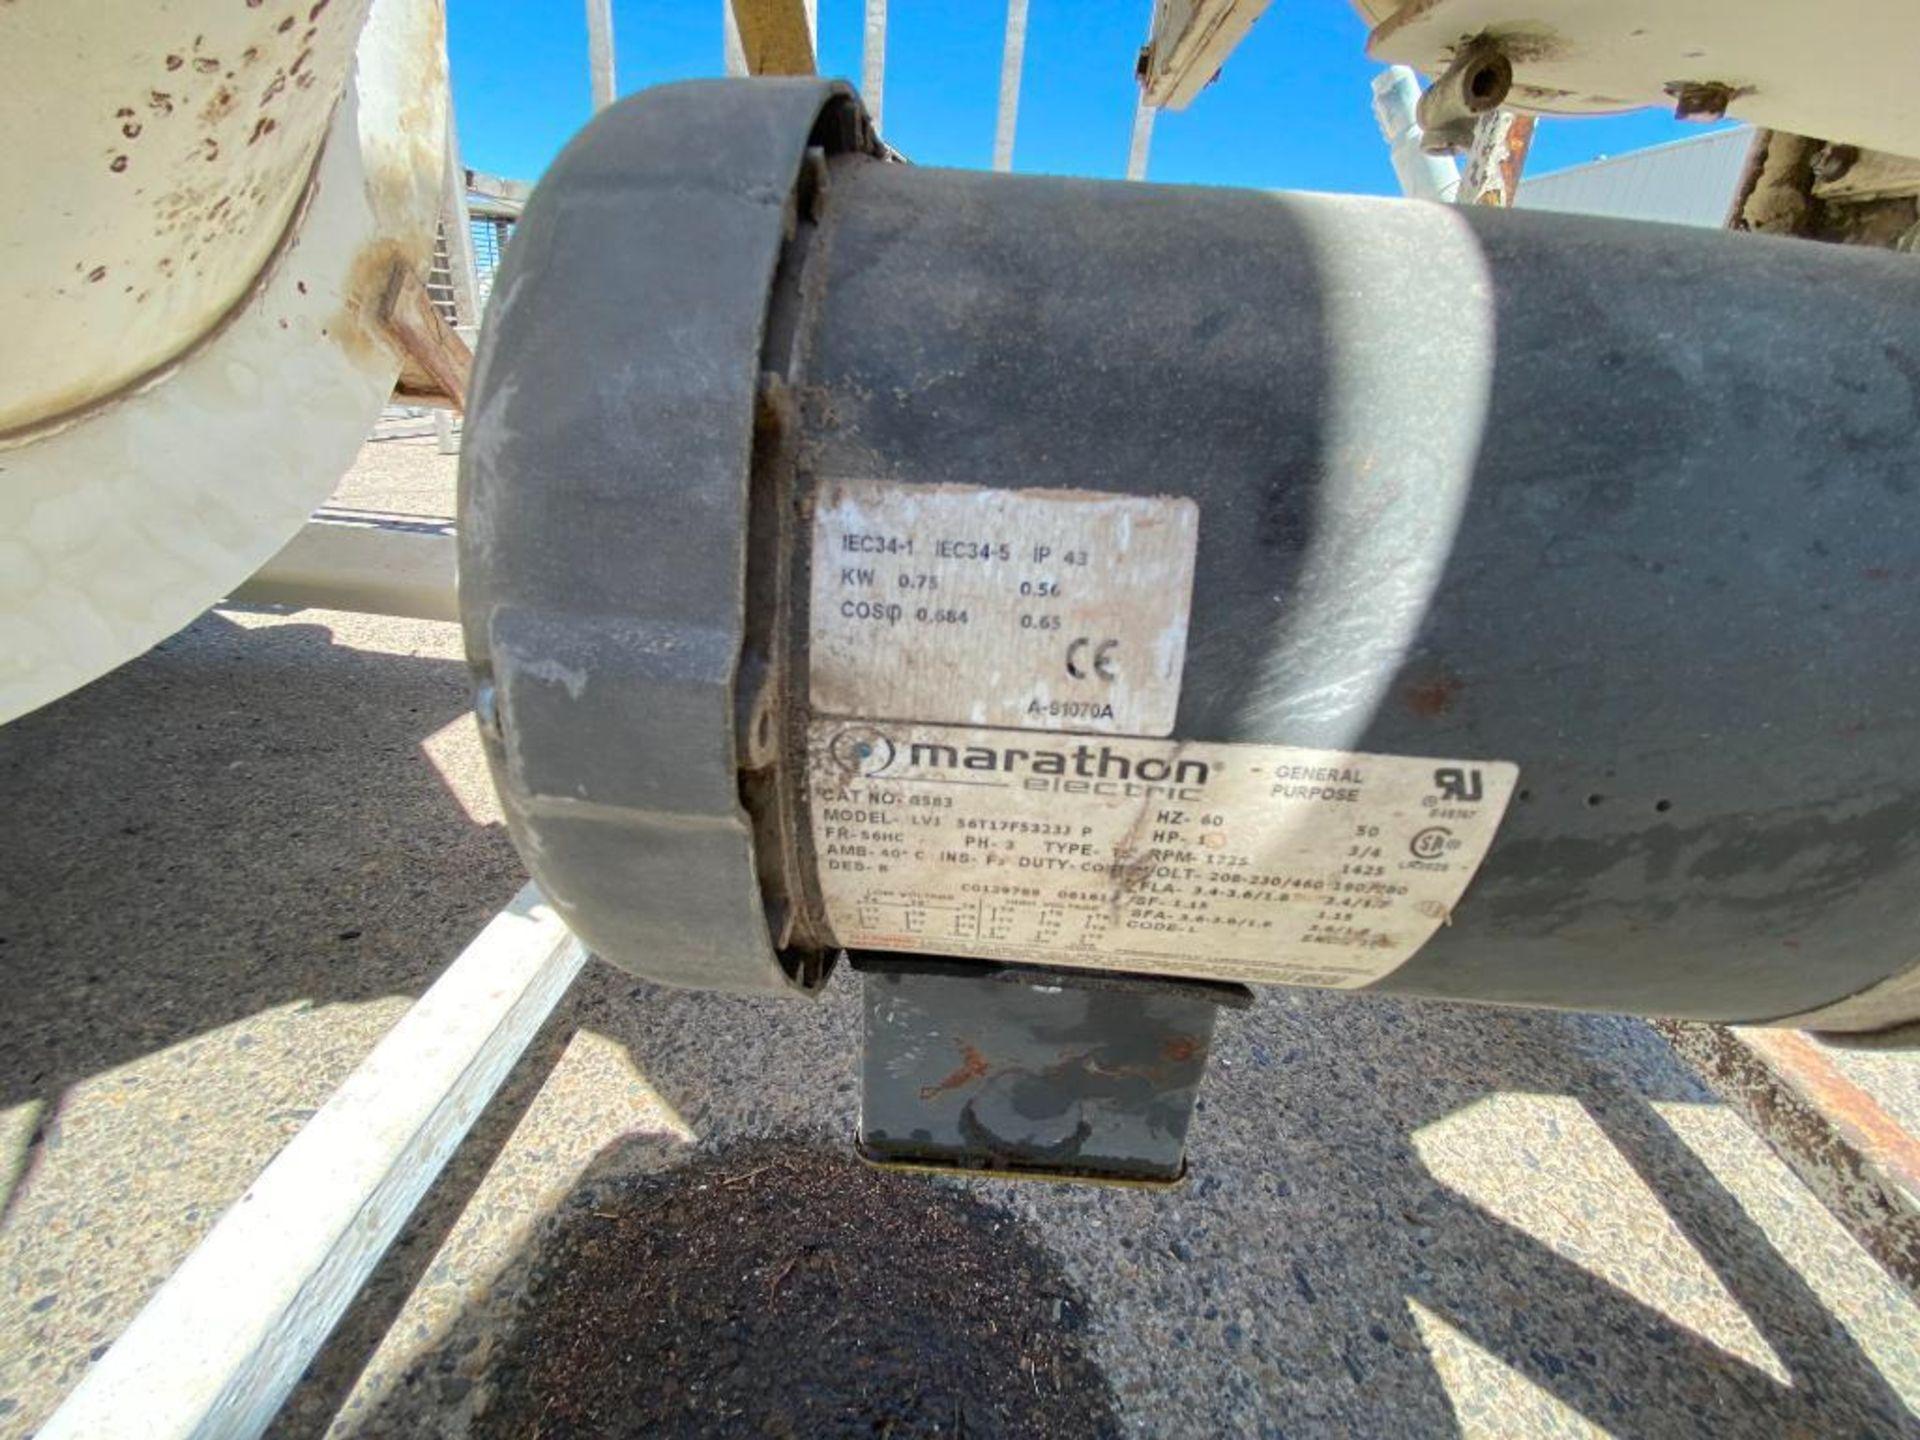 mild steel baghouse - Image 3 of 9